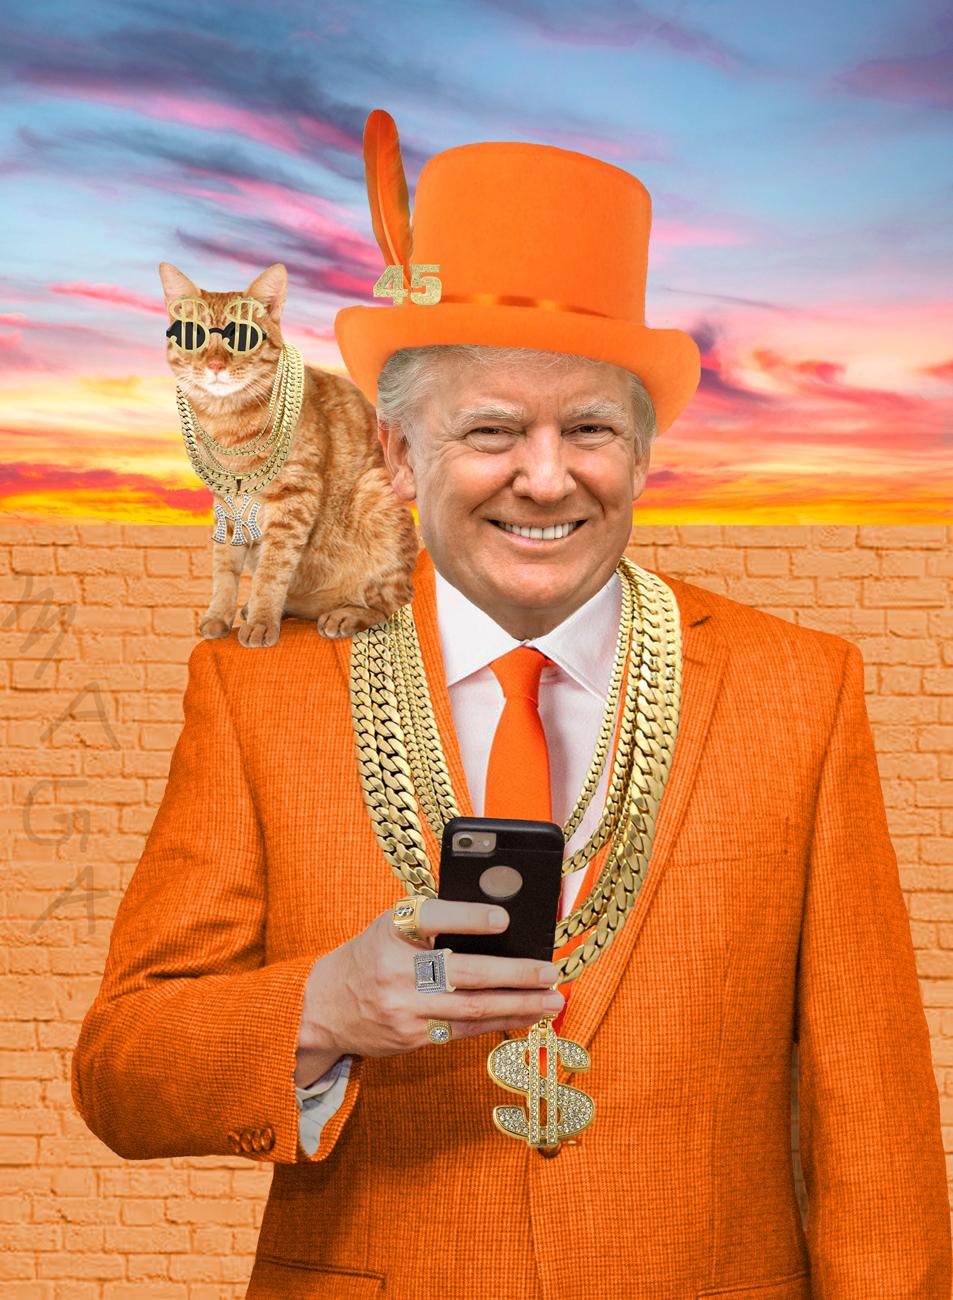 Julia_McLaurin_Donald Trump.jpg